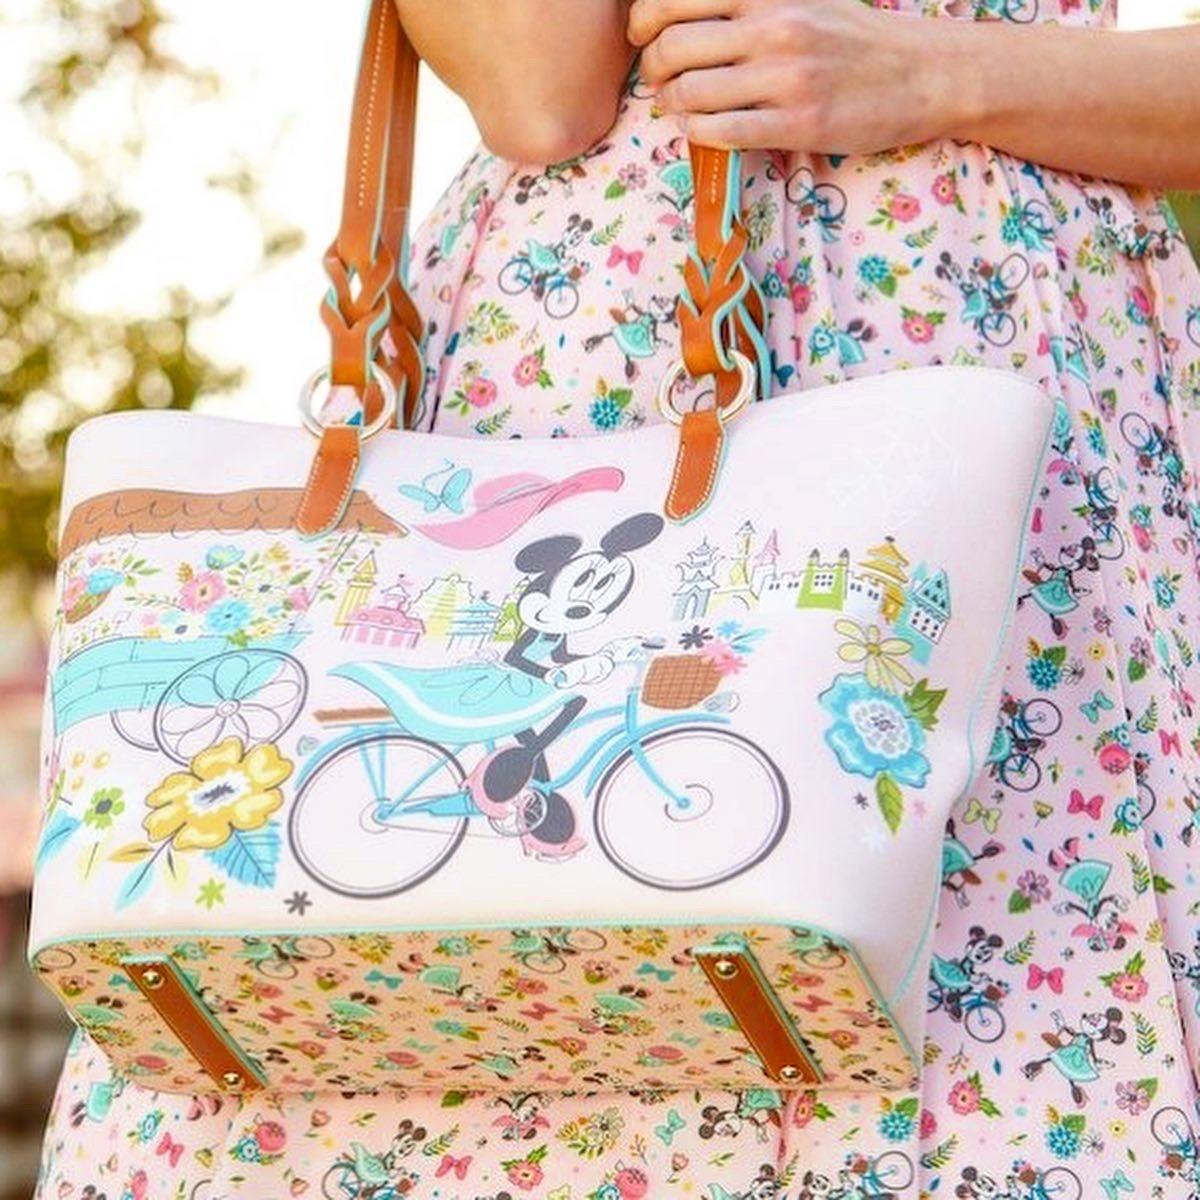 Epcot Flower & Garden Festival Merch Preview! 1